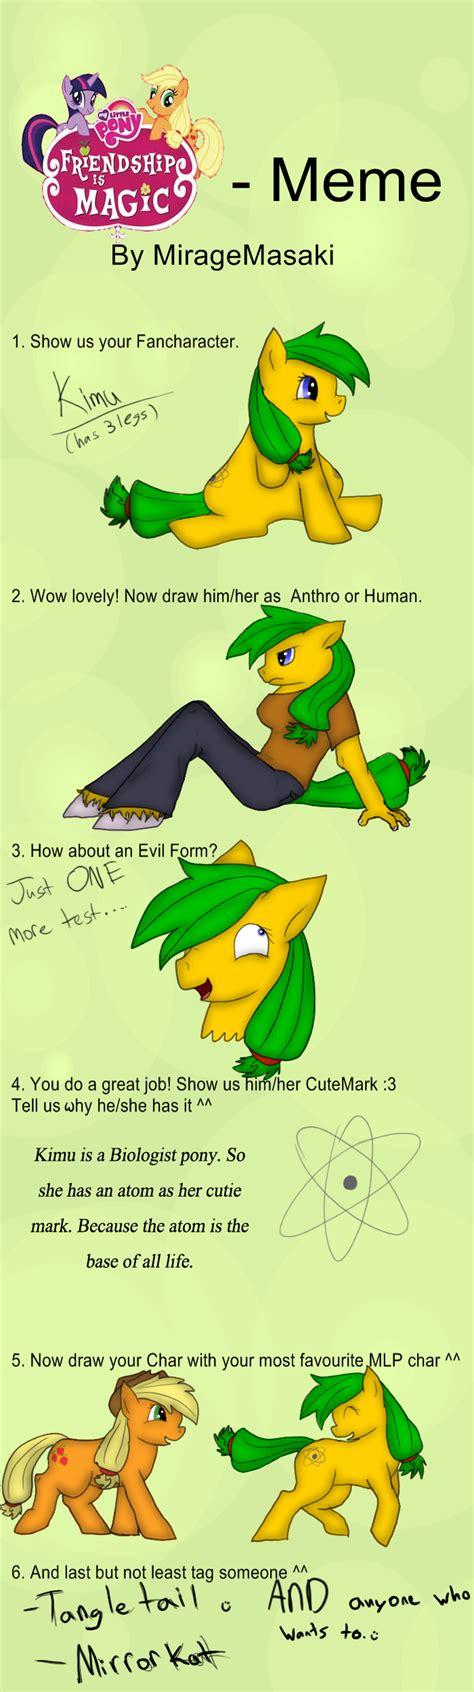 Mlp Fim Memes - mlp fim fancharacter meme by thedragonfreak77 on deviantart